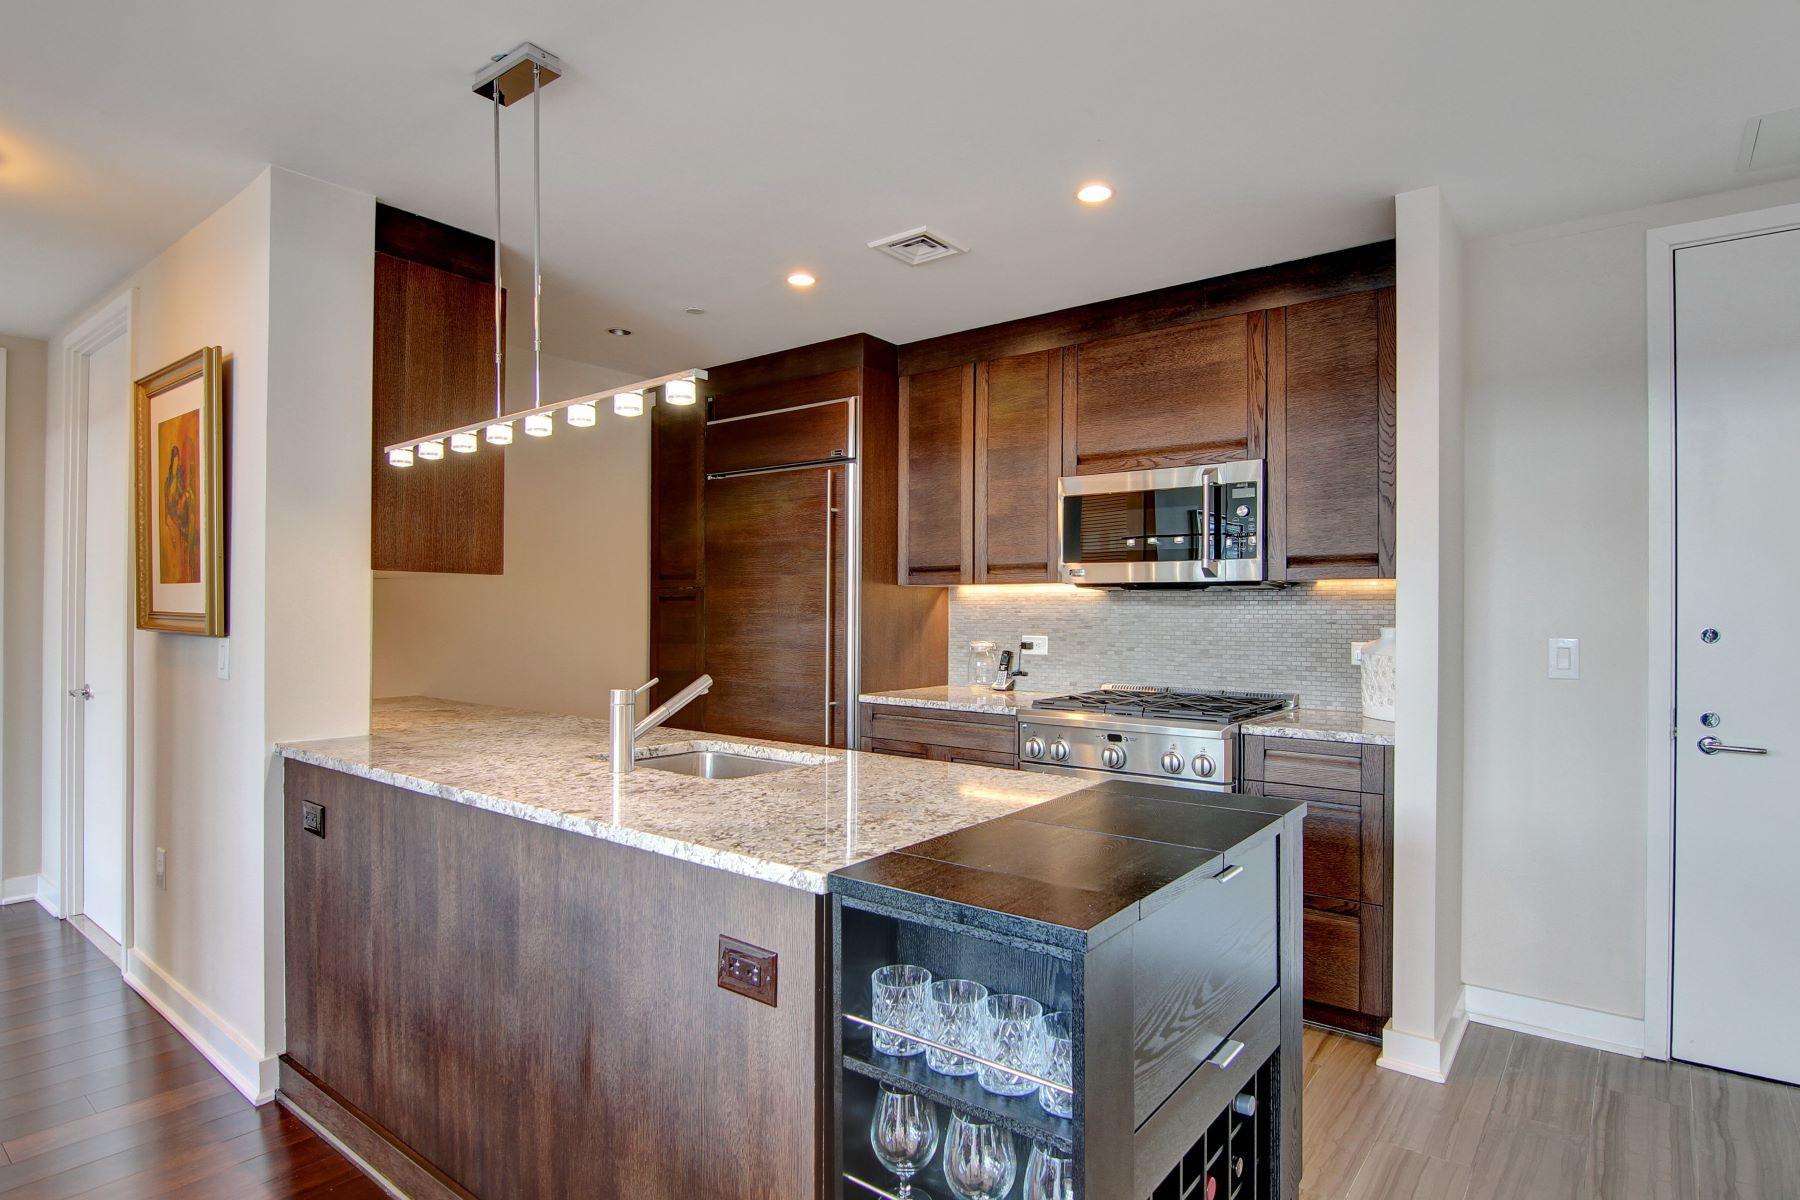 Condomínio para Venda às World Class Luxury Awaits! 1000 Avenue At Port Imperial #708 Weehawken, Nova Jersey, 07086 Estados Unidos